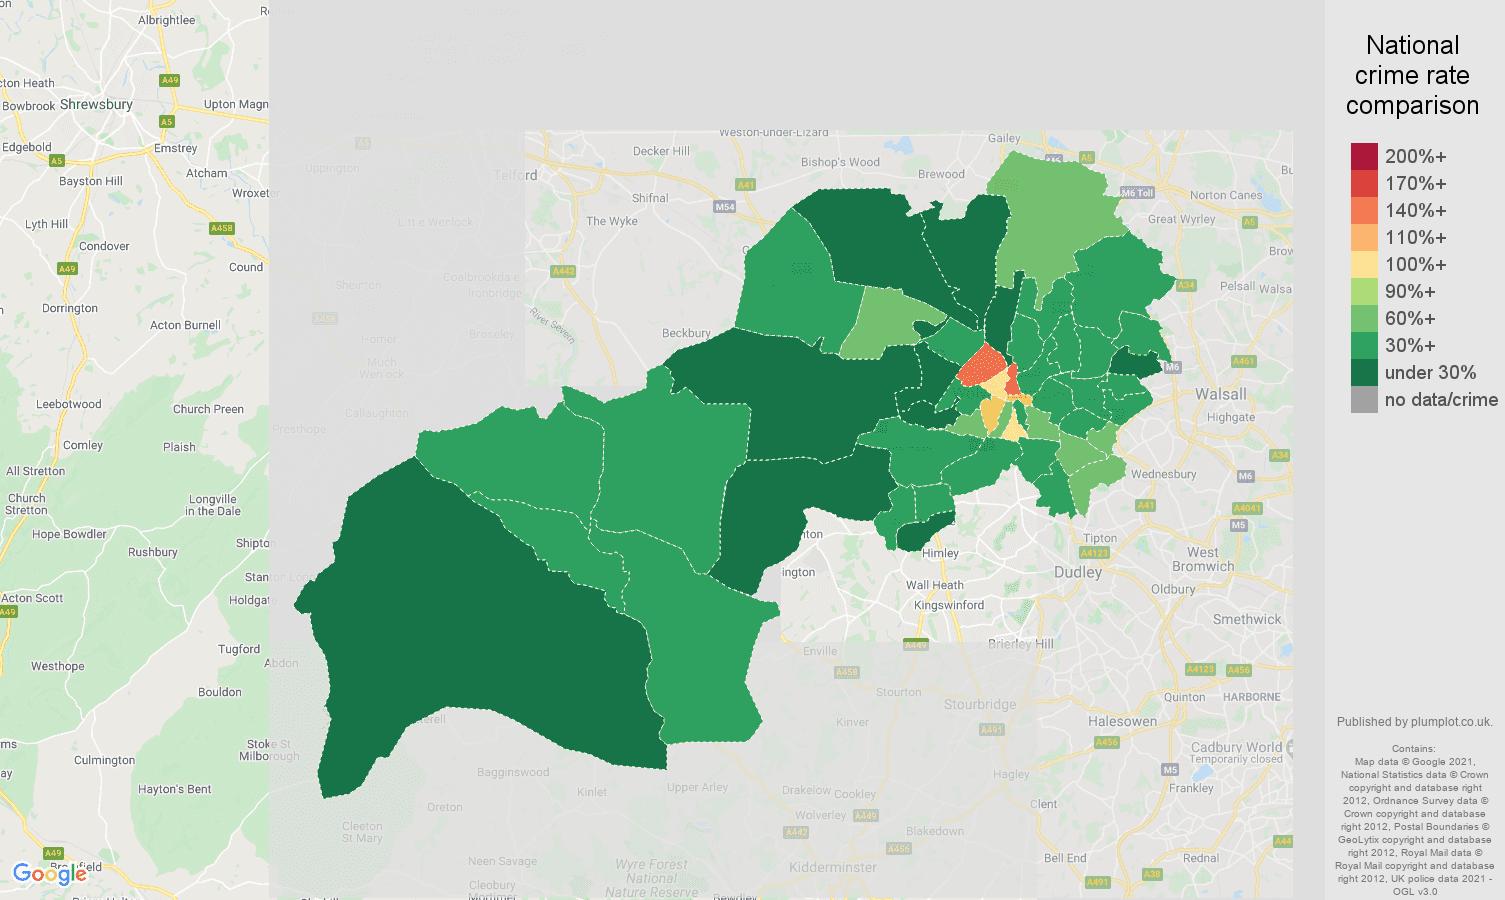 Wolverhampton drugs crime rate comparison map